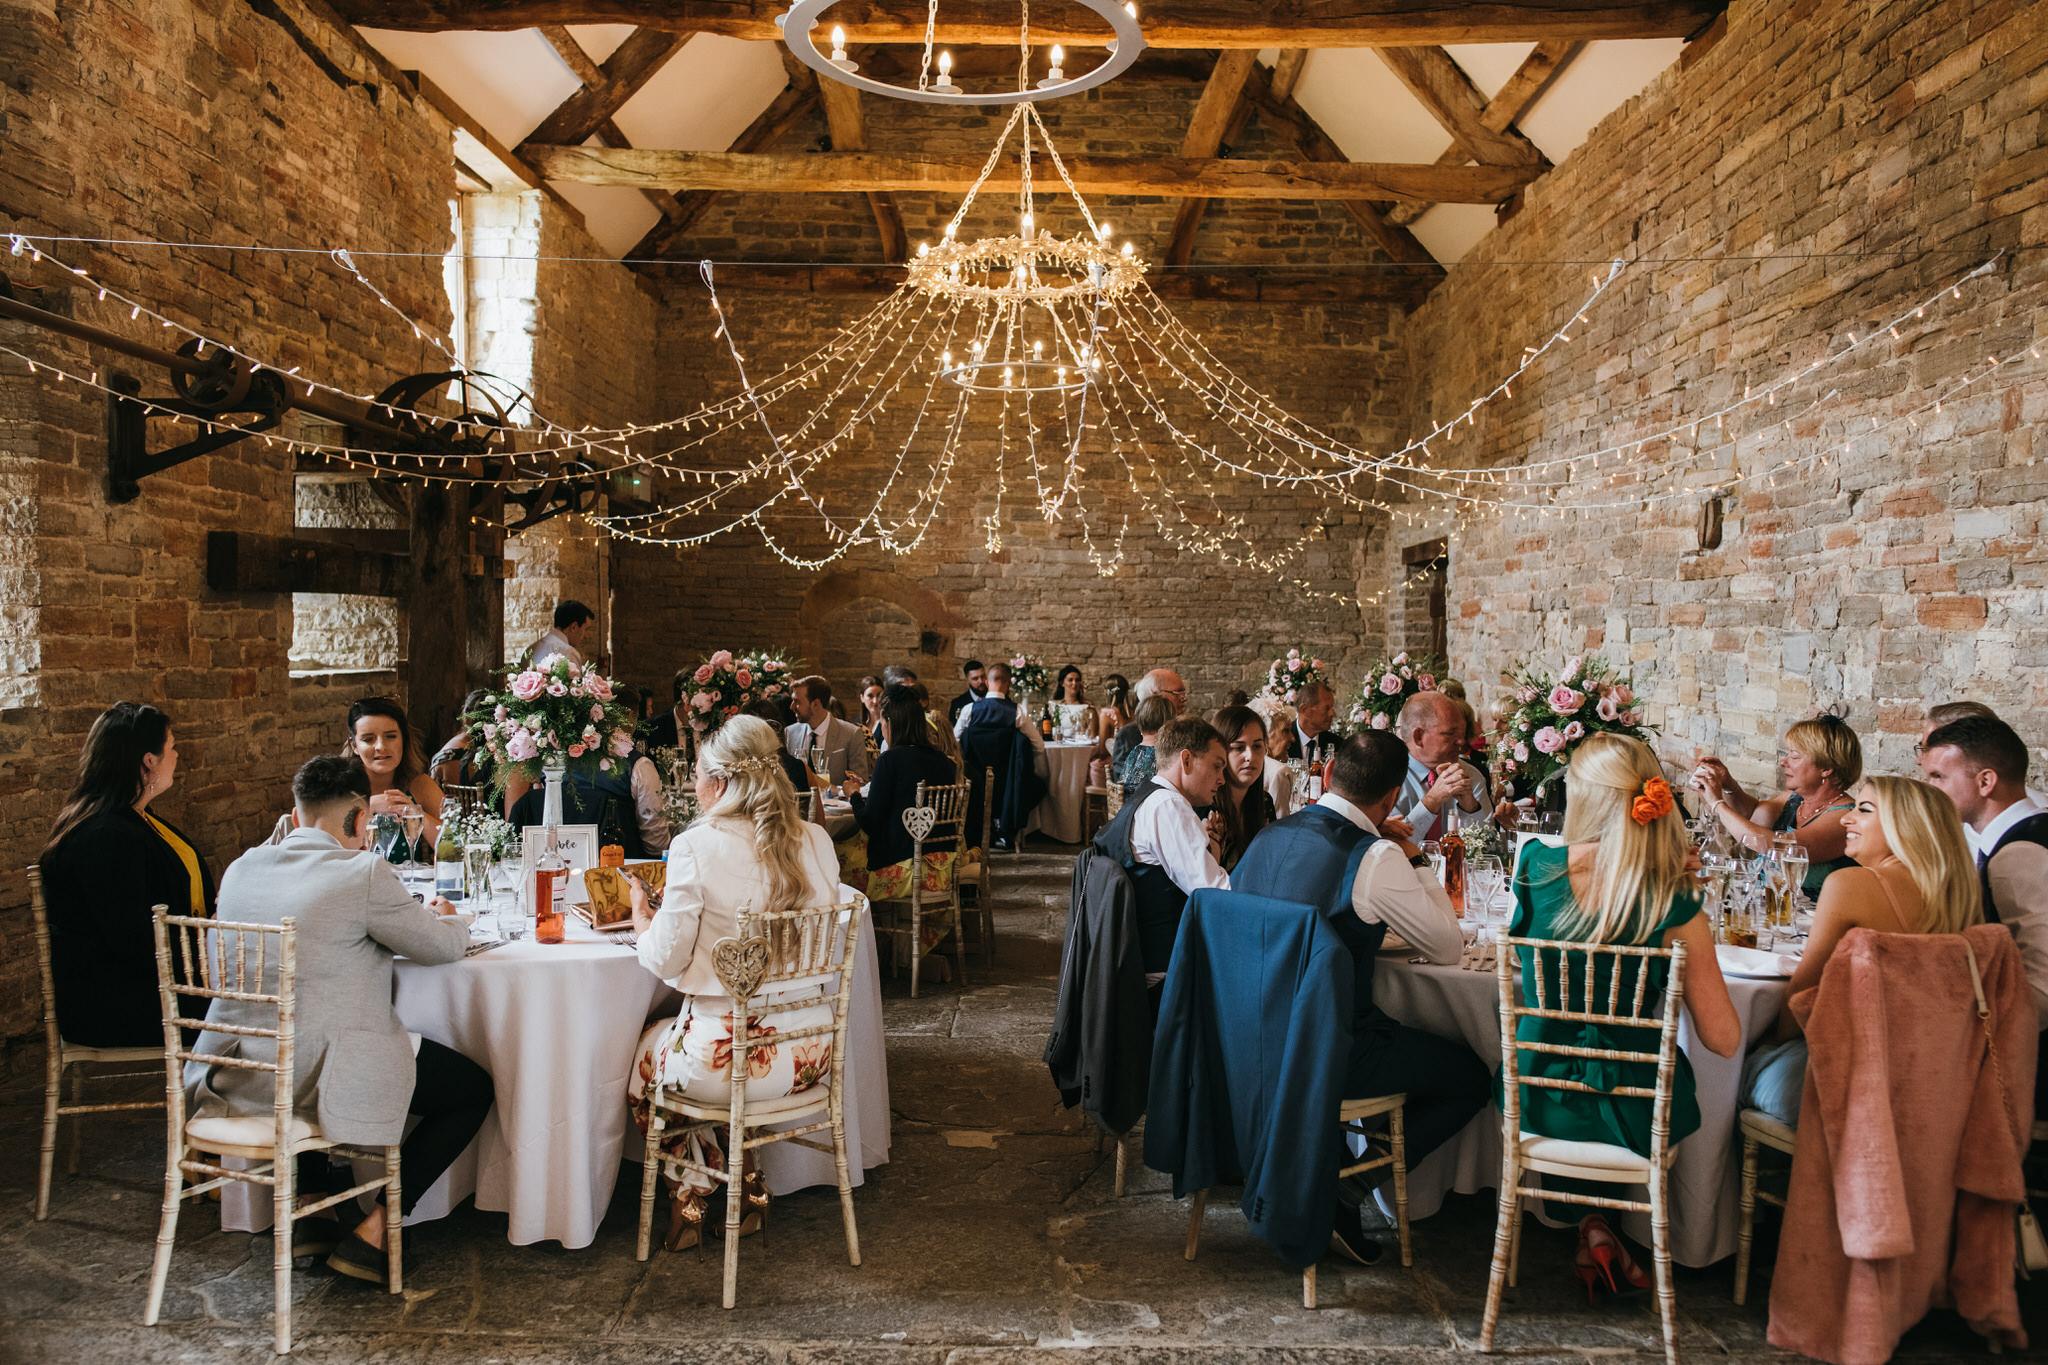 Almonry barn wedding breakfast